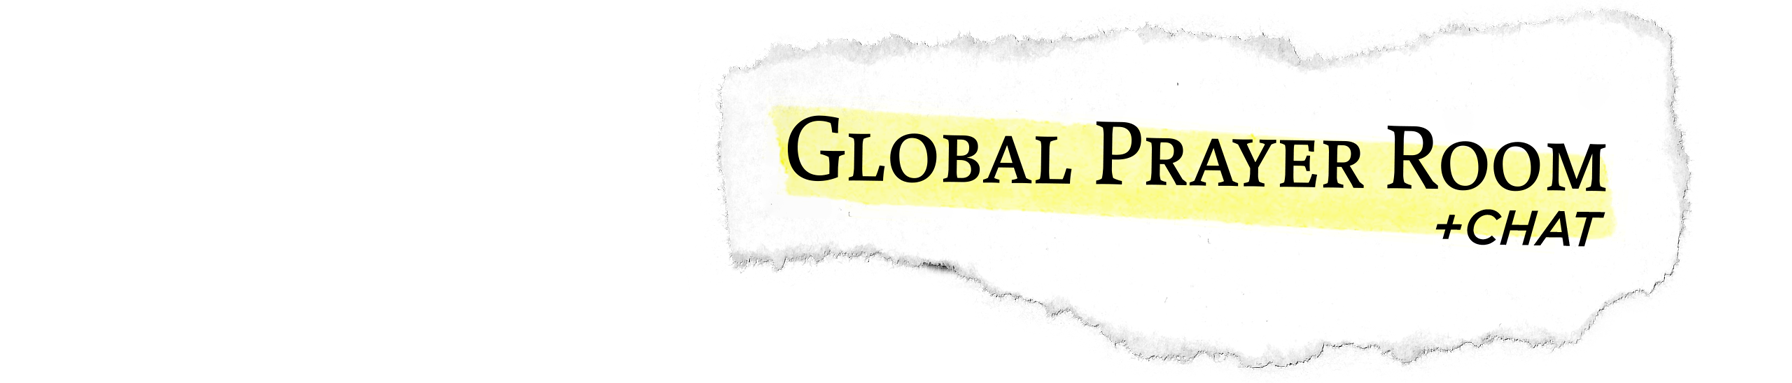 Global Prayer Room + Chat